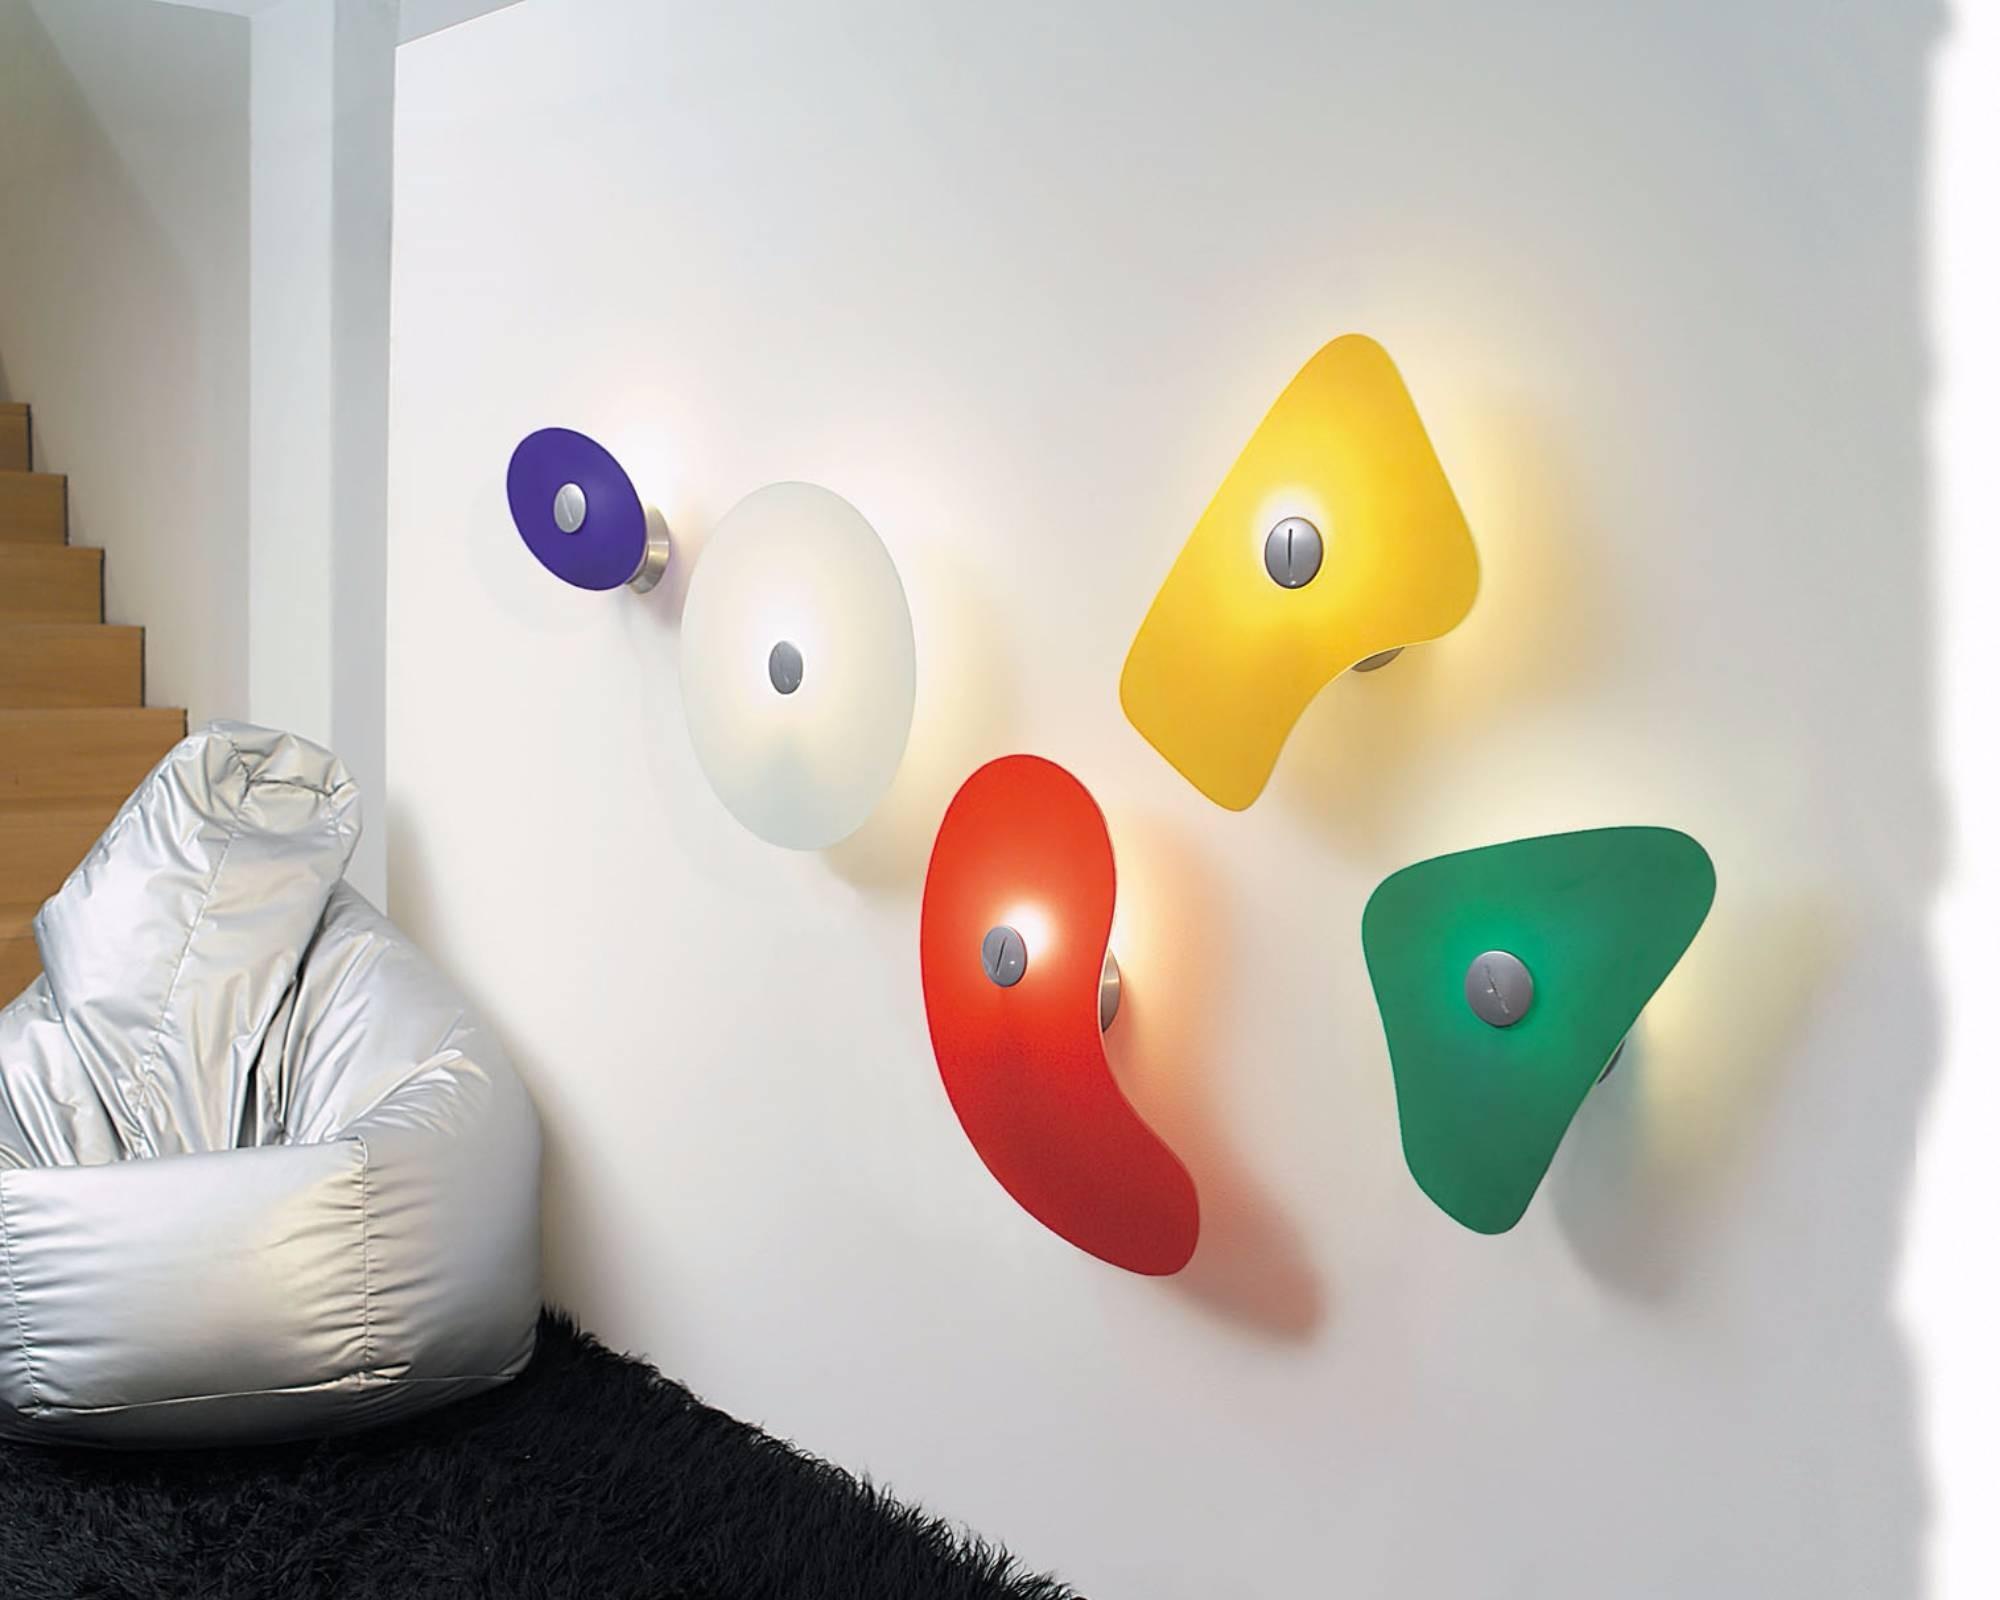 Bit Wall Lamp